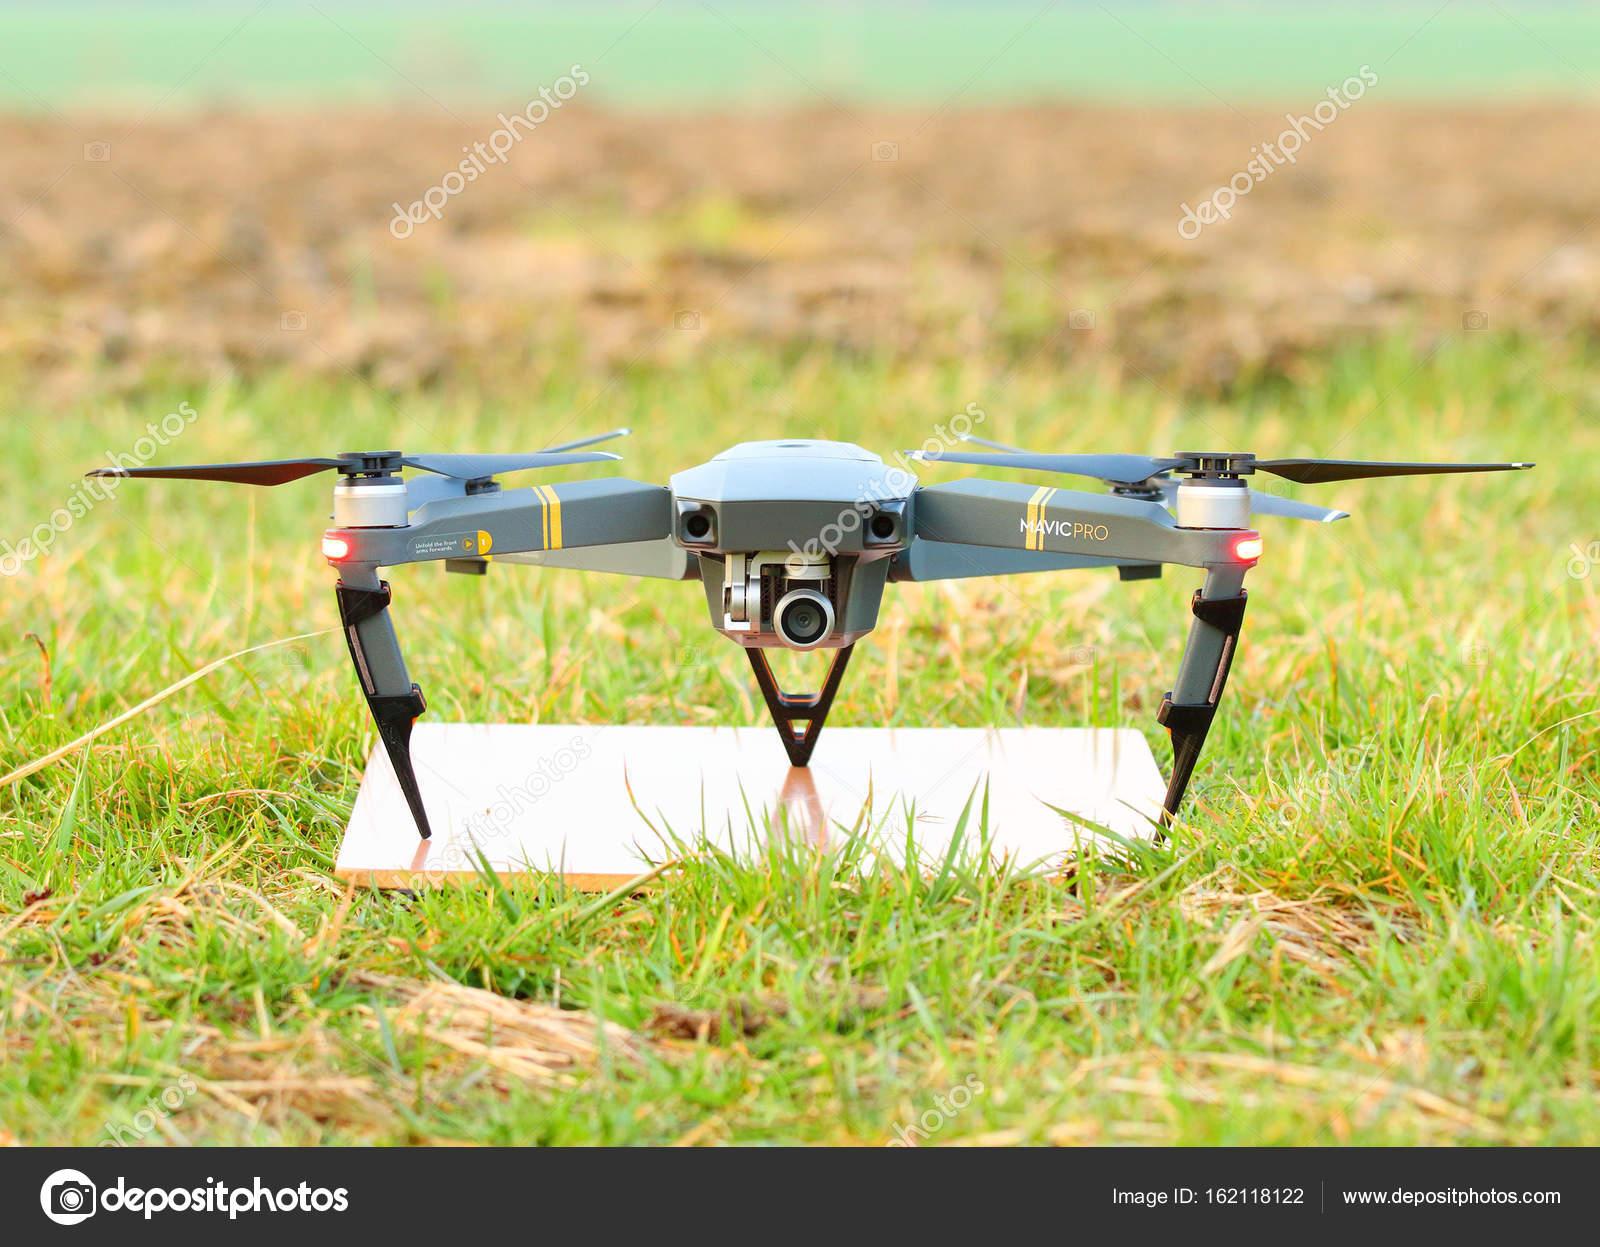 Commander parot drone et avis avis drone jjrc h47